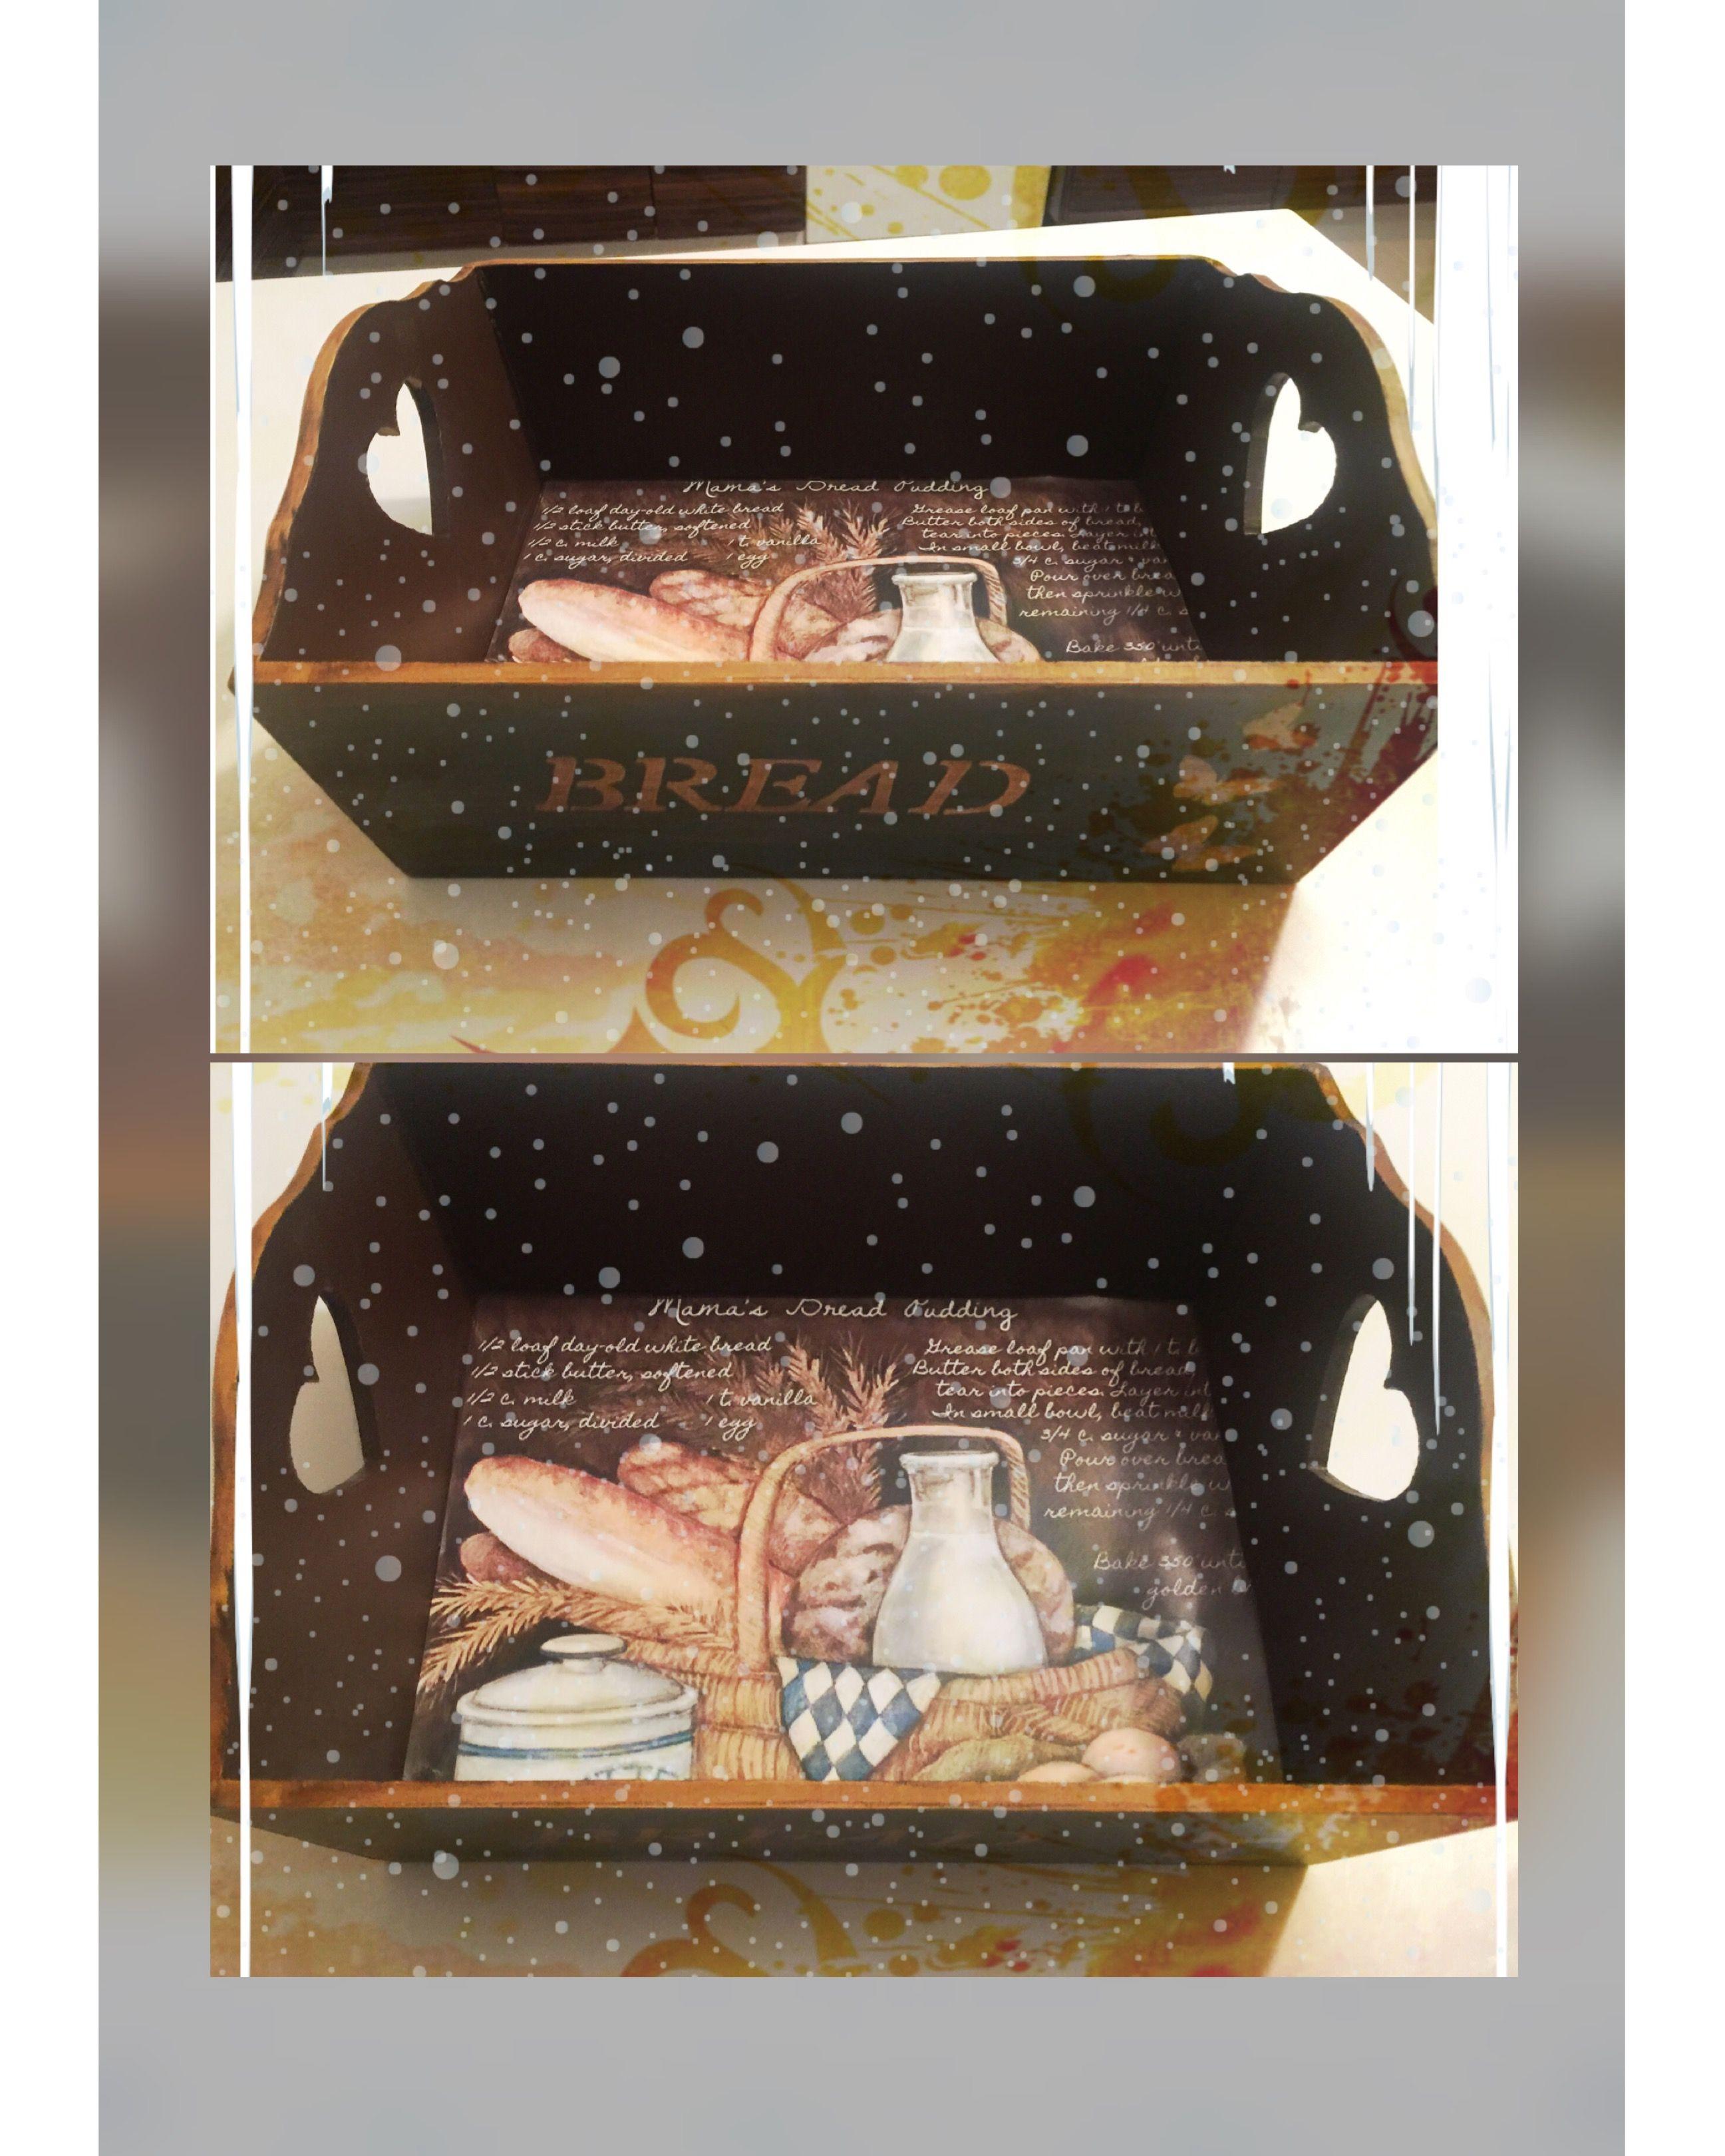 Ahsap Boyama Ekmek Sepeti Kutular Resim Sanati Sepetler